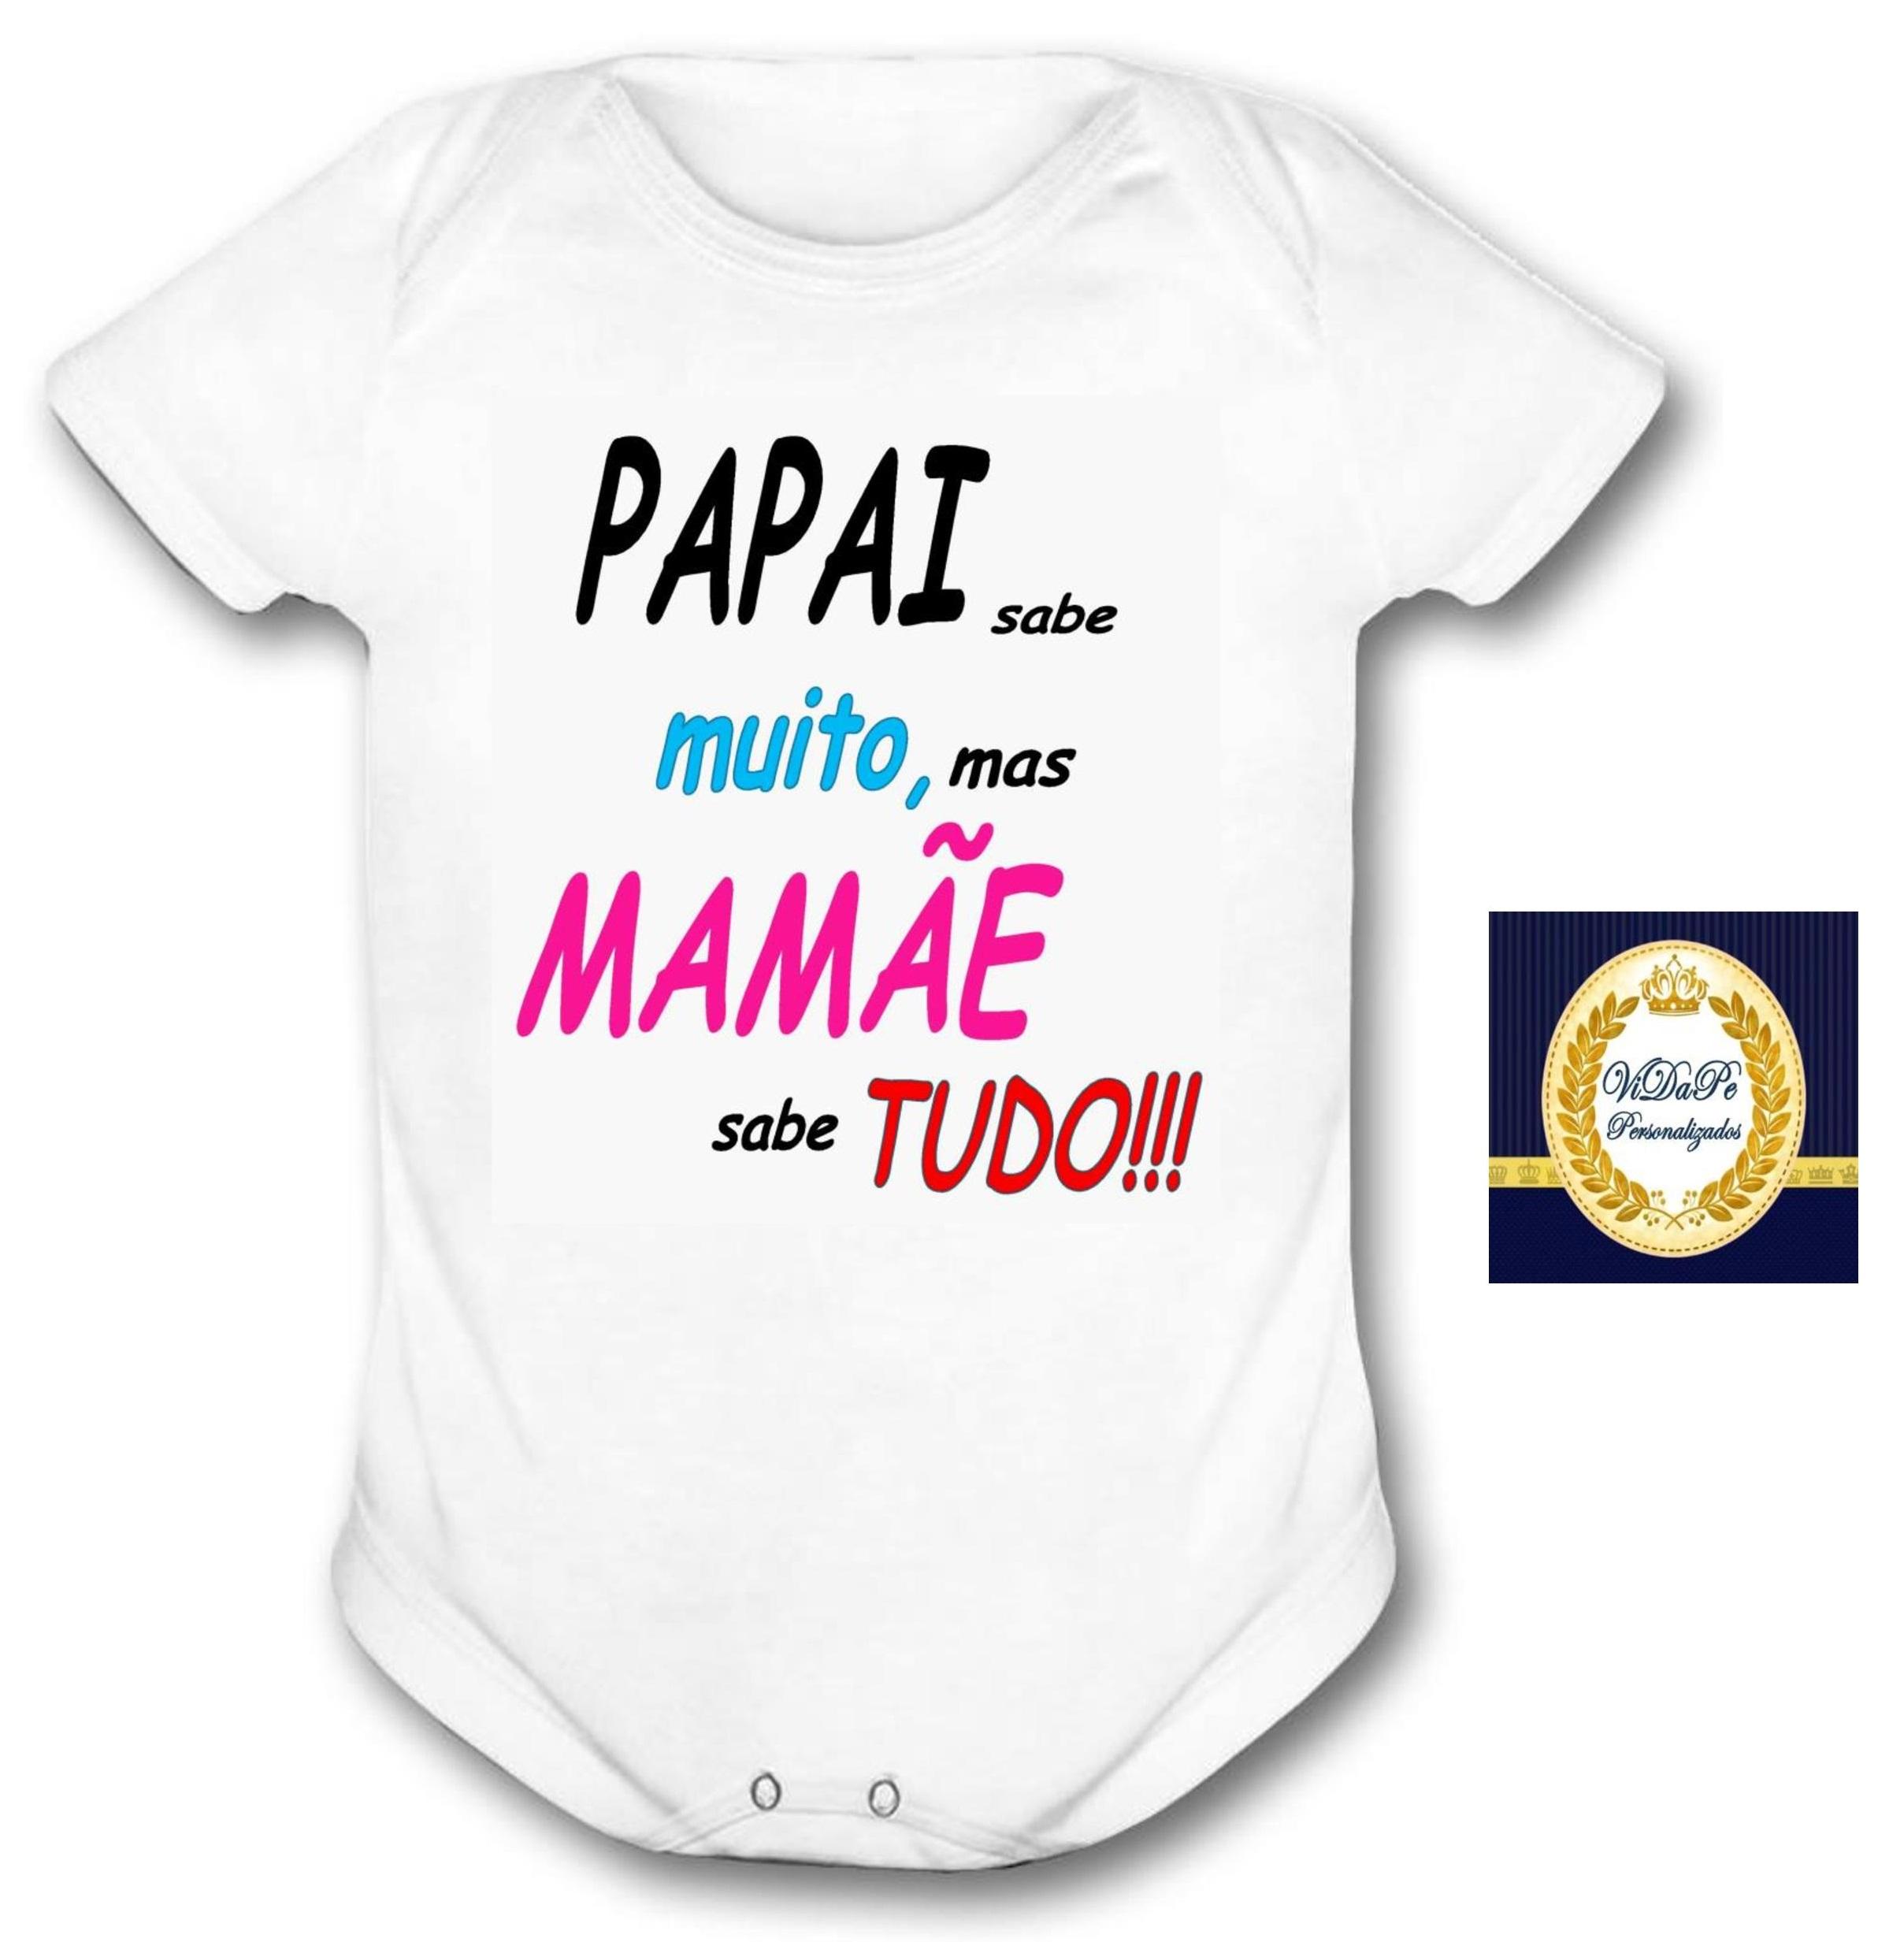 Body Bebe Personalizado Frase Divertida No Elo7 Gracinha Baby 62c79e